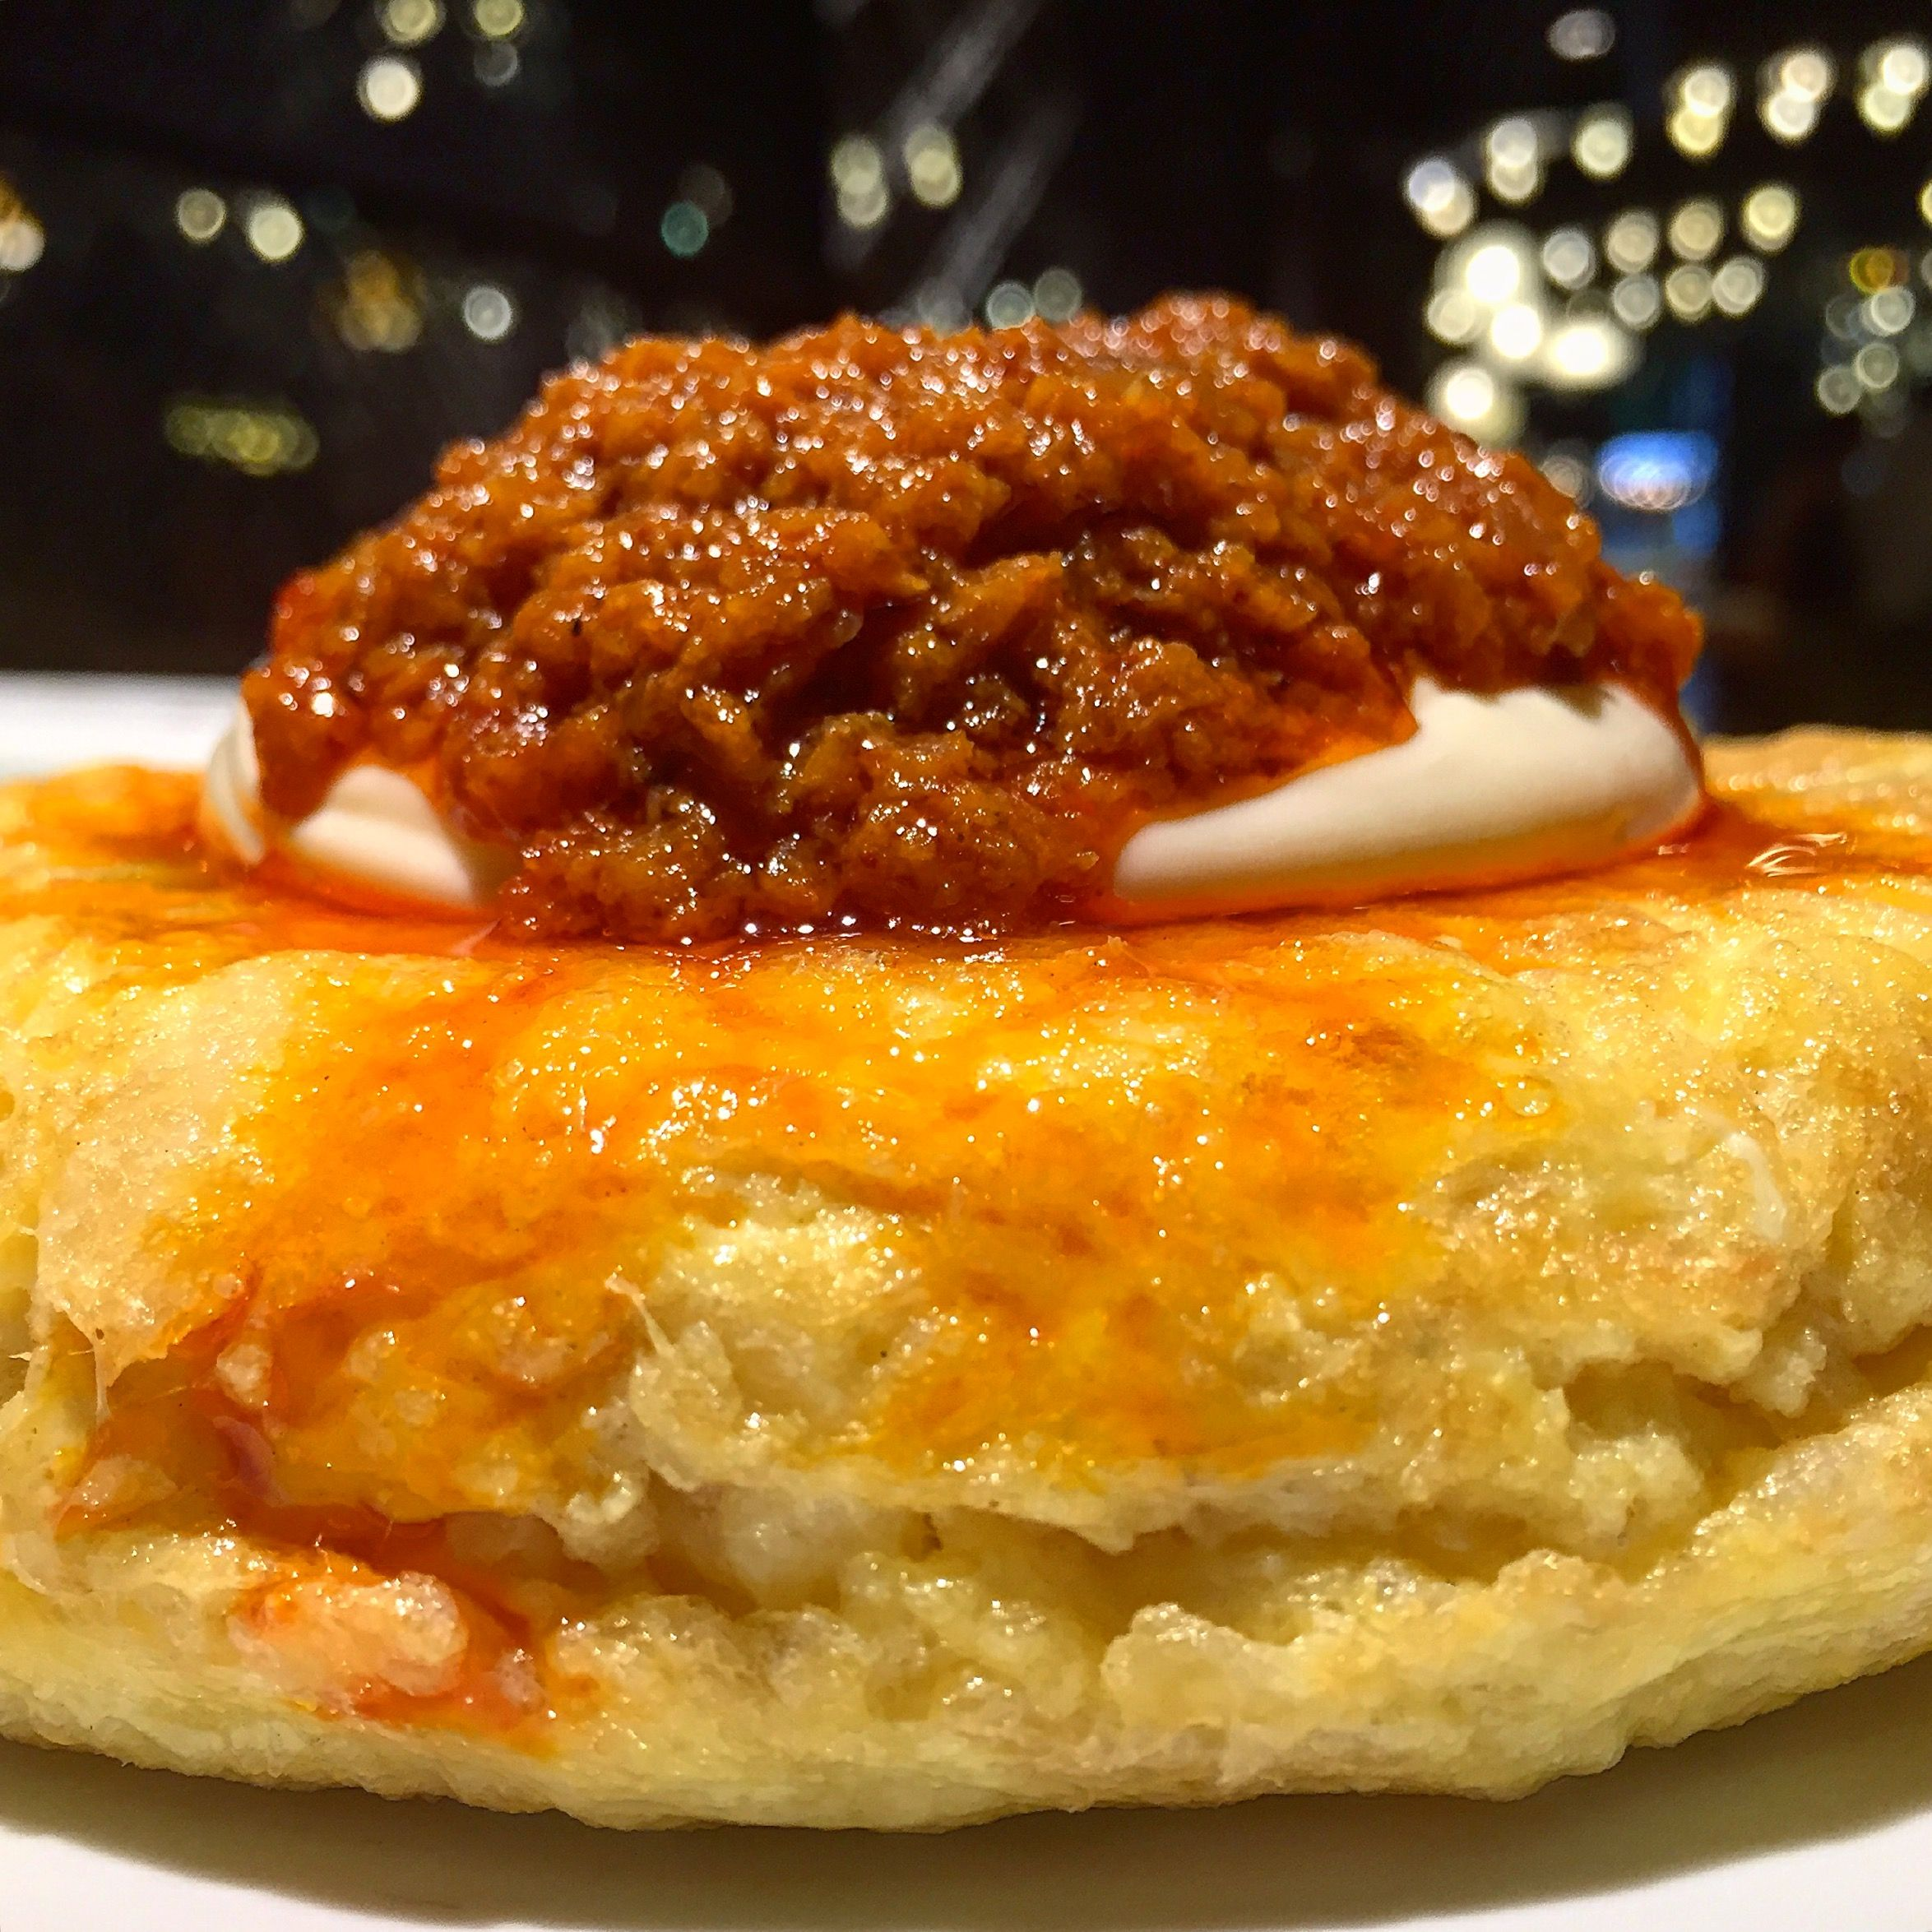 Truita de patates amb salsa brava